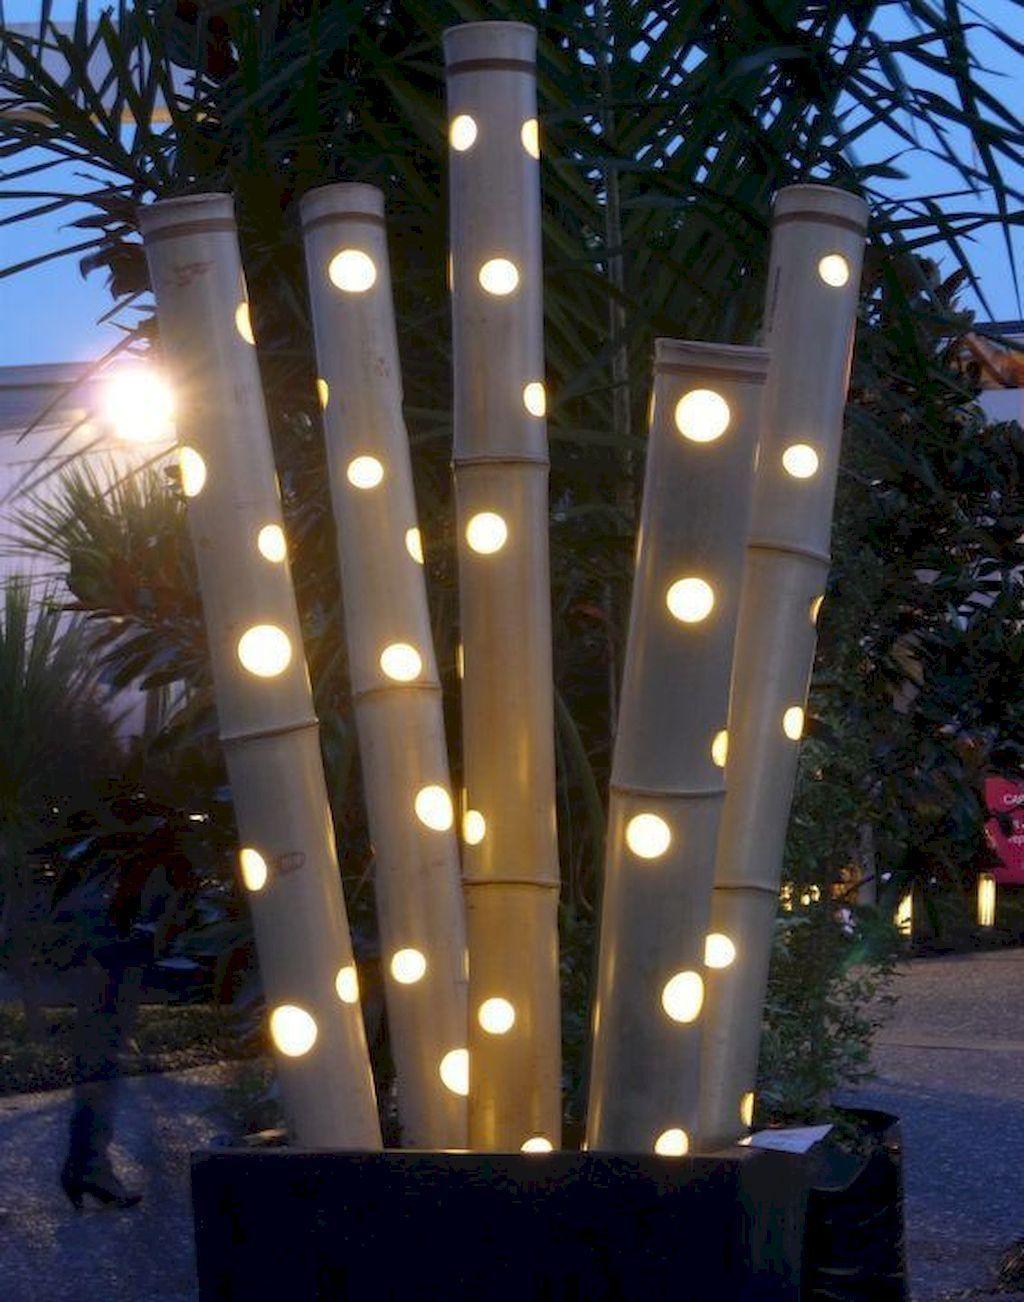 Country Decor Lighting Design Outdoor Lighting Design Outdoor Lobby Lighting De In 2020 Landscape Lighting Design Garden Lighting Design Outdoor Garden Lighting